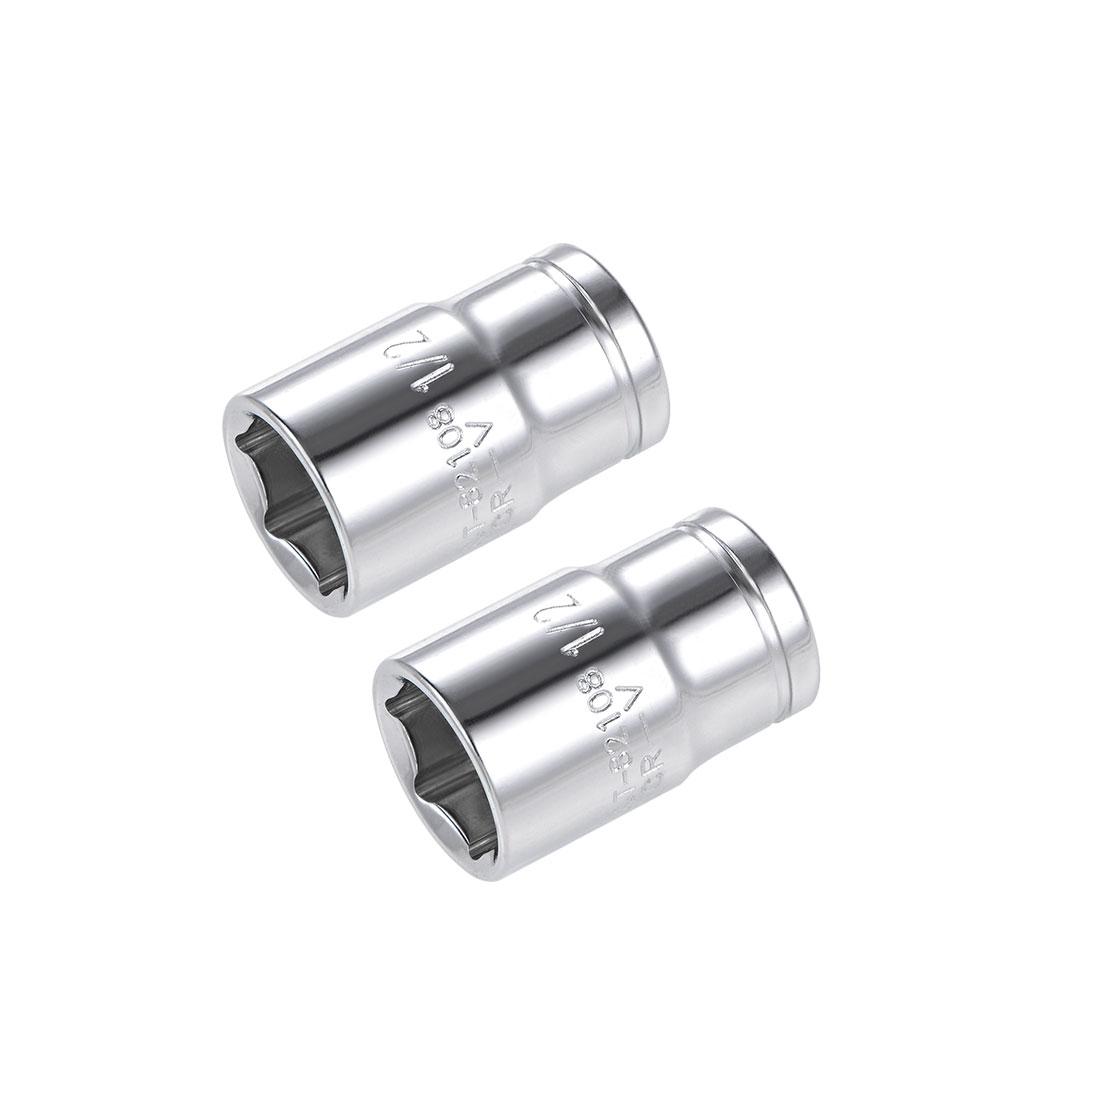 2 Pcs 3/8-inch Drive 1/2-inch 6-Point Shallow Socket Tool, Cr-V